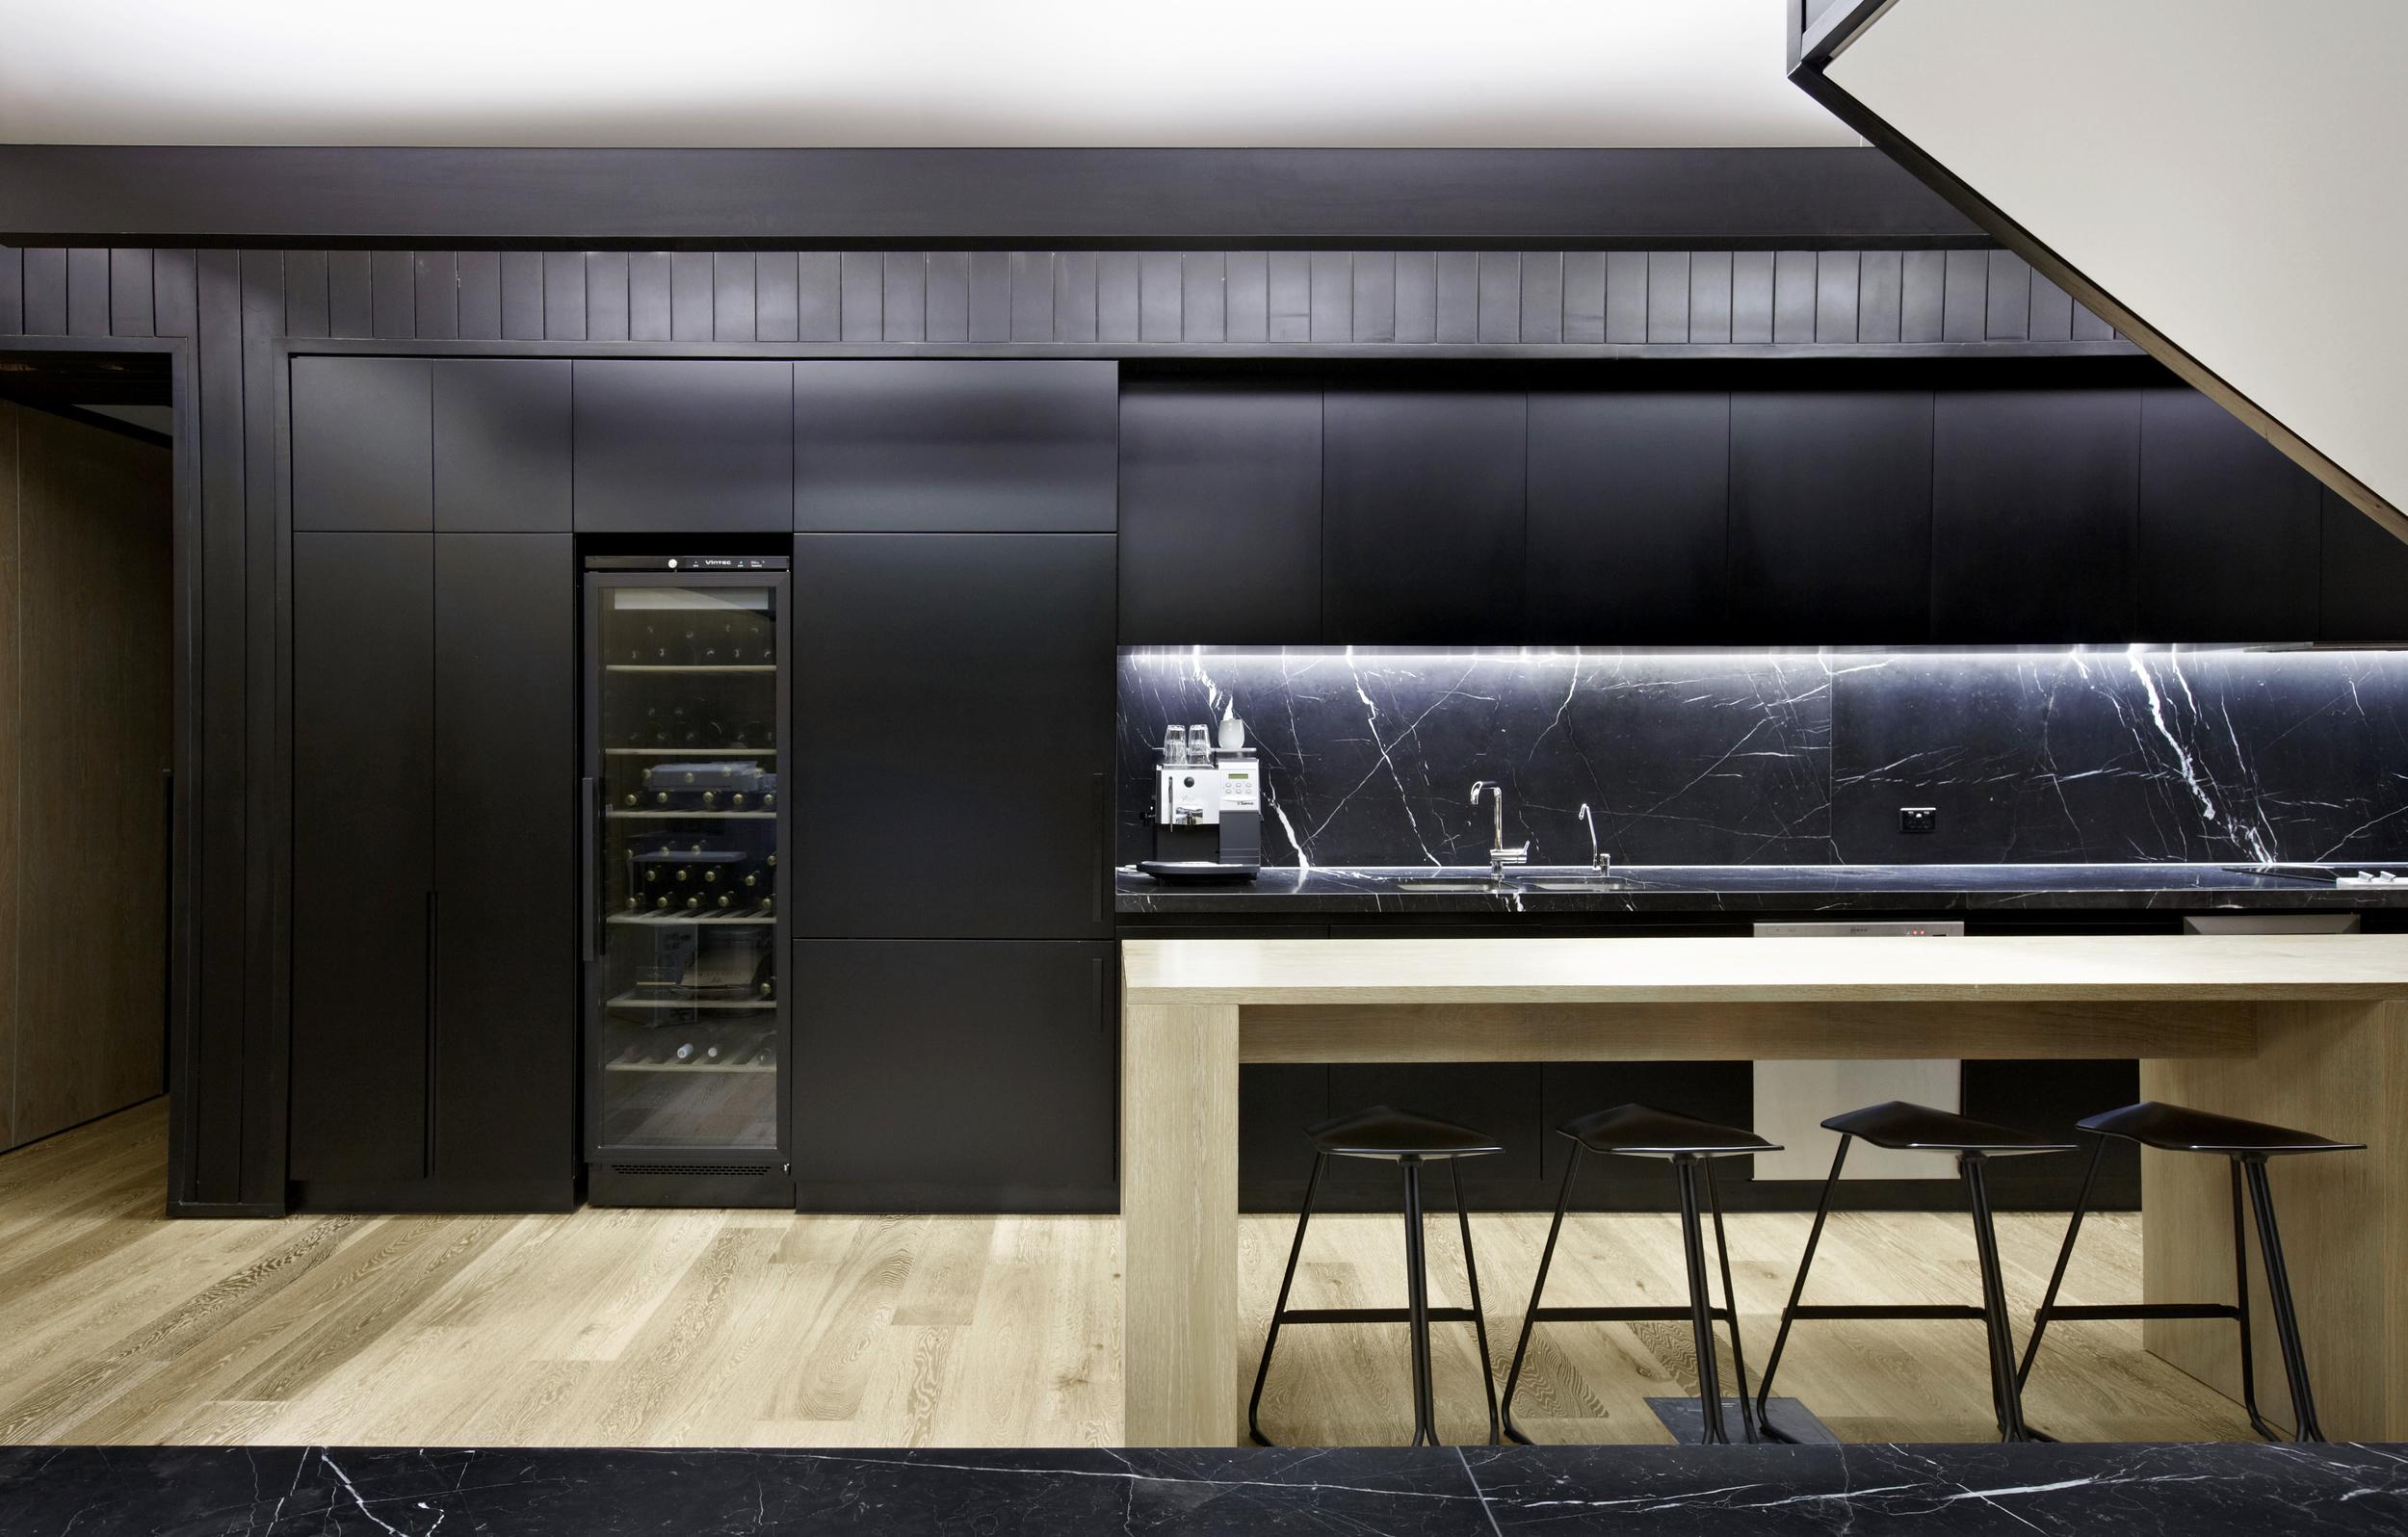 Black kitchen design by Chamberlain Architects